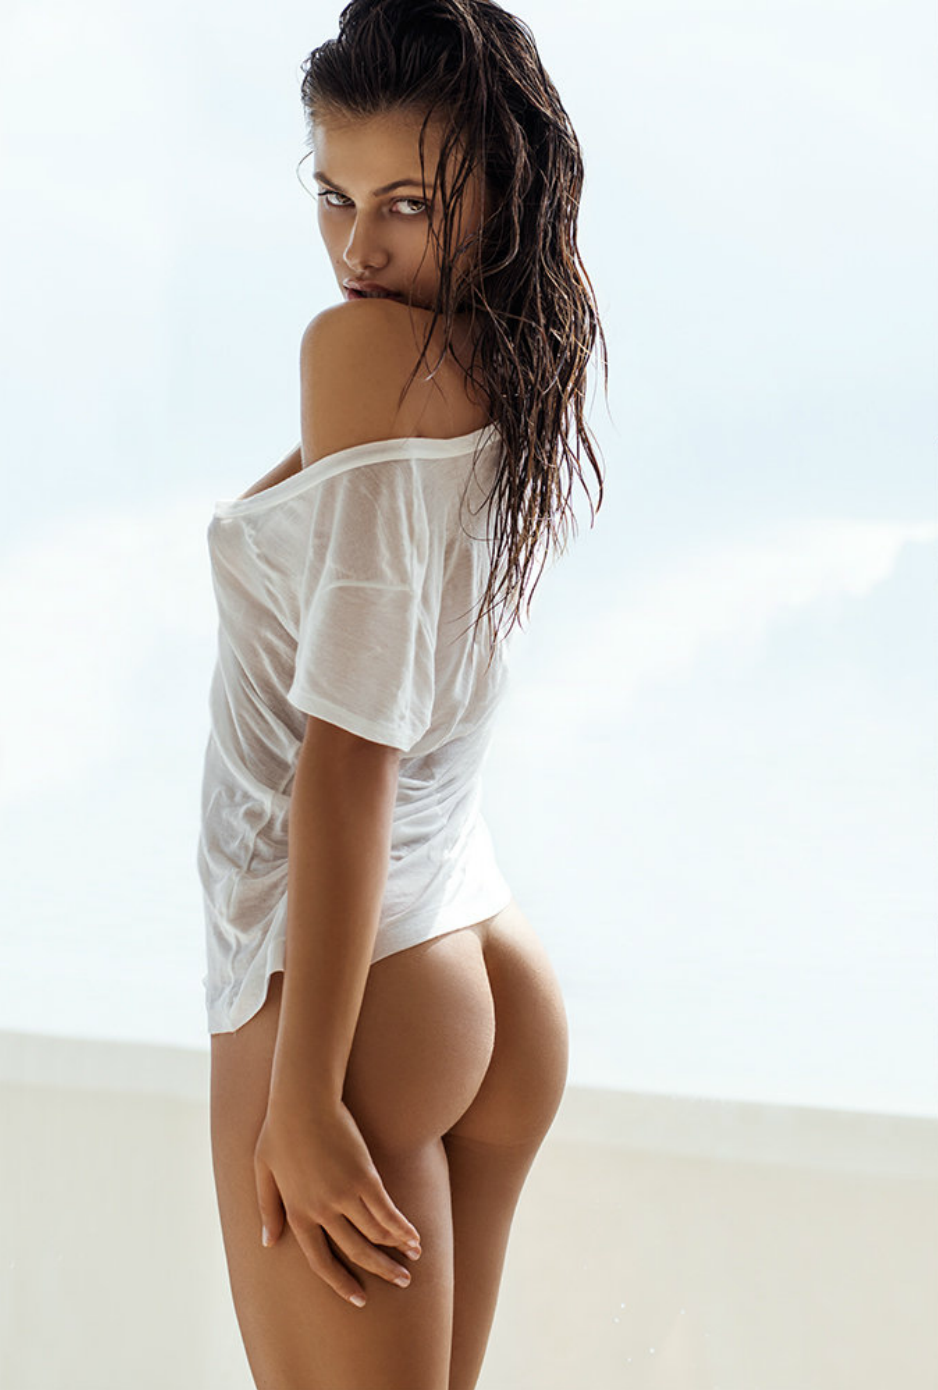 Yara Khmidan naked (77 pictures) Leaked, Snapchat, cleavage